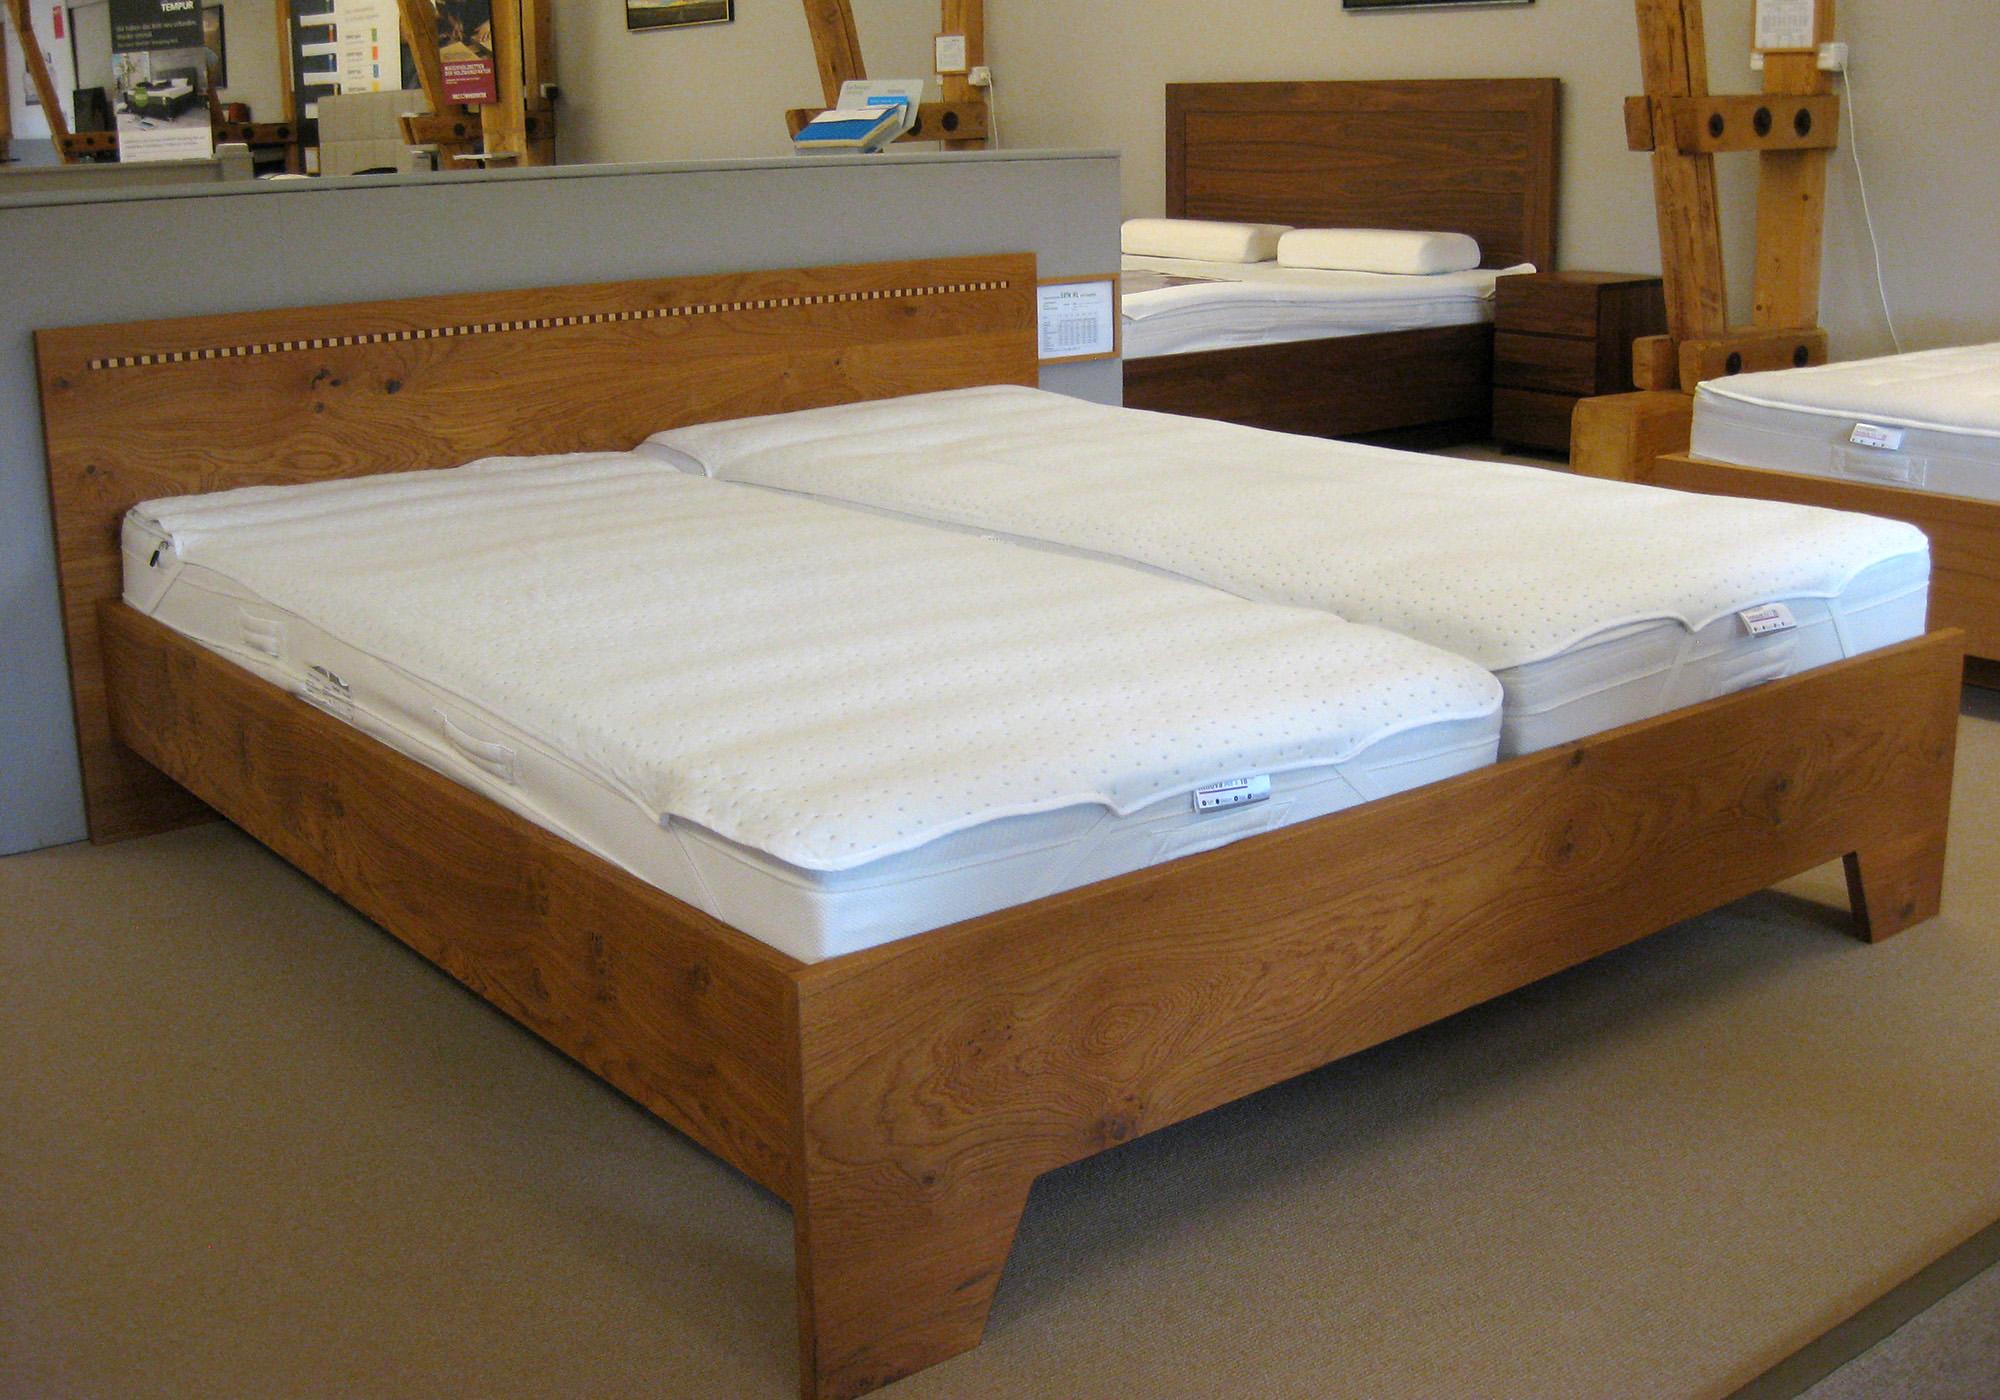 ausstellungs angebote zum abholpreis betten kraft. Black Bedroom Furniture Sets. Home Design Ideas